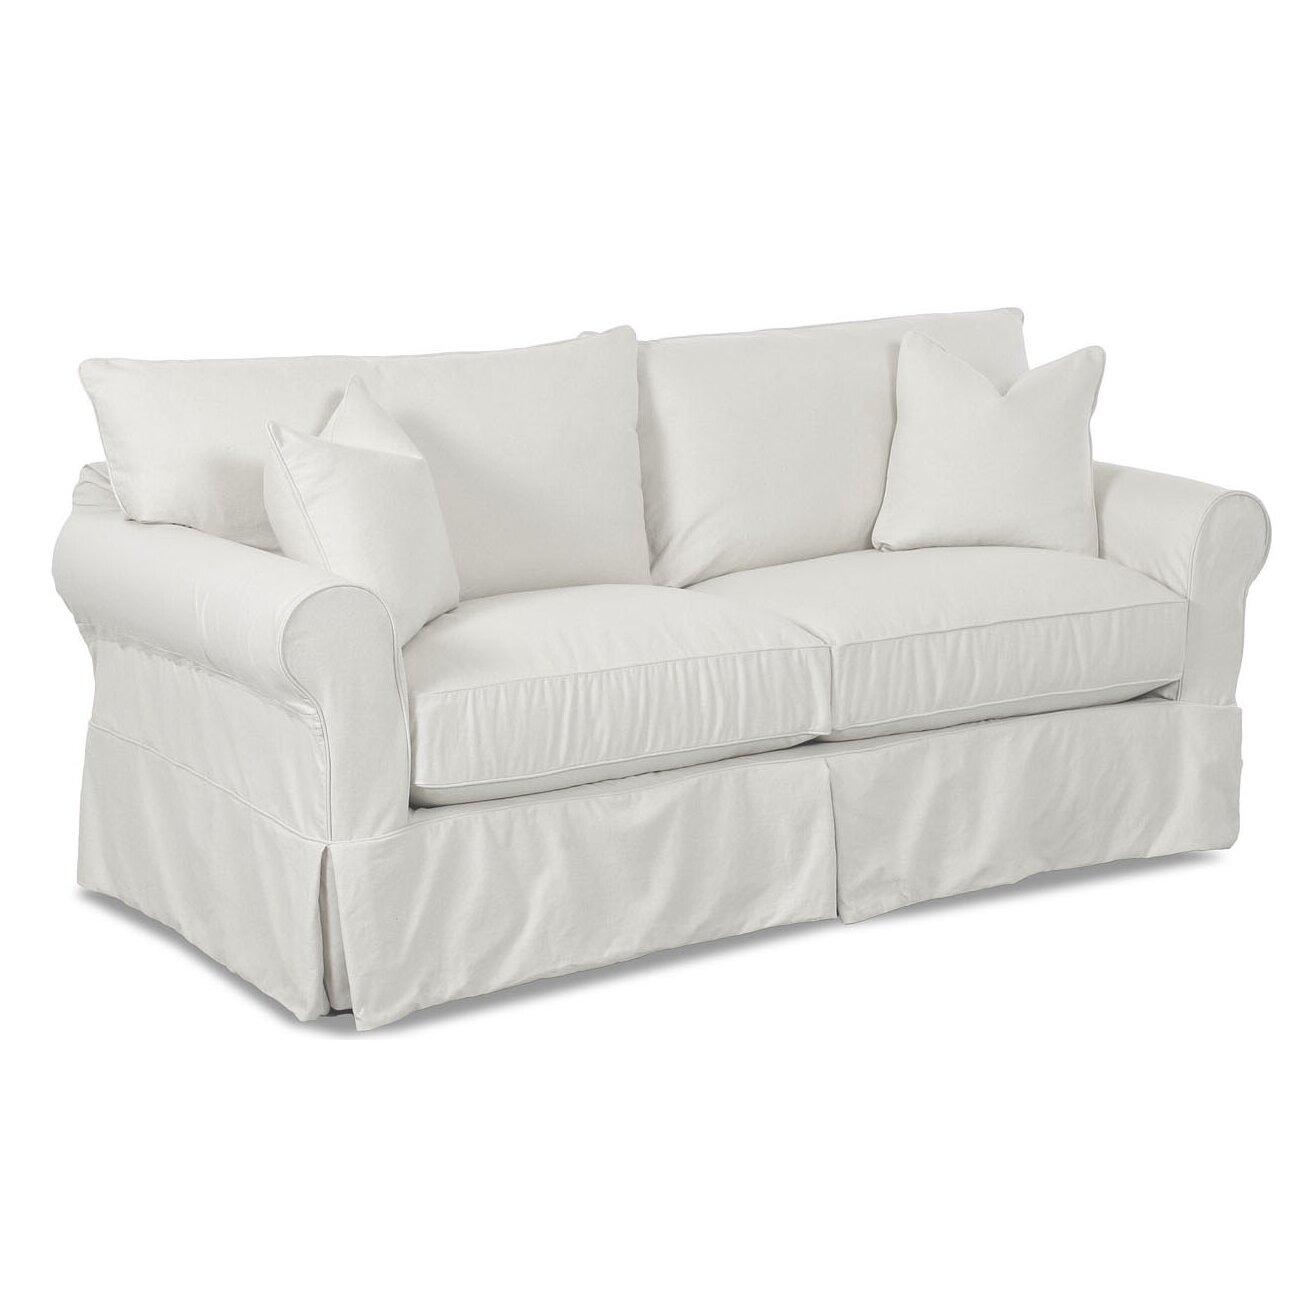 Wayfair Custom Upholstery Felicity Sleeper Sofa & Reviews